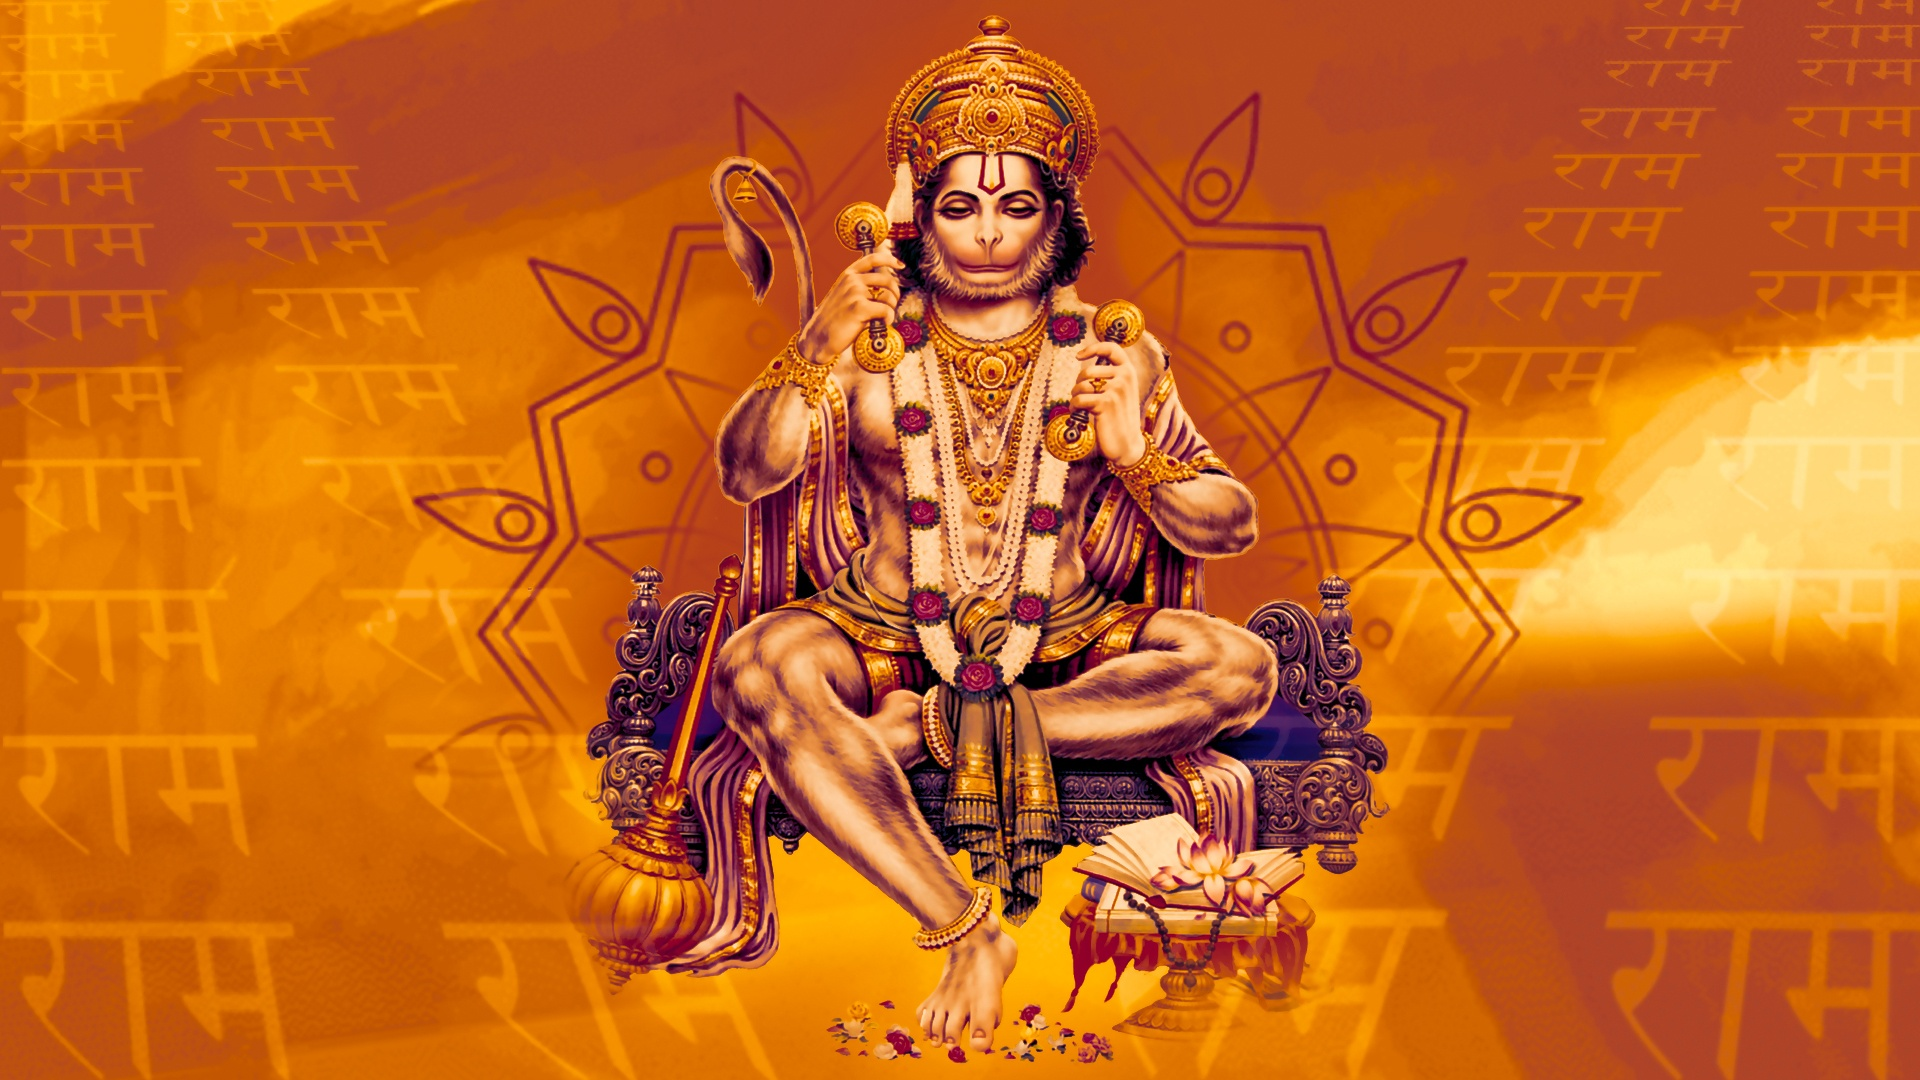 Lord Ganesha 3d Wallpapers Free Download Ram Bhakt Hanumanji Wallpaper Other Wallpaper Better